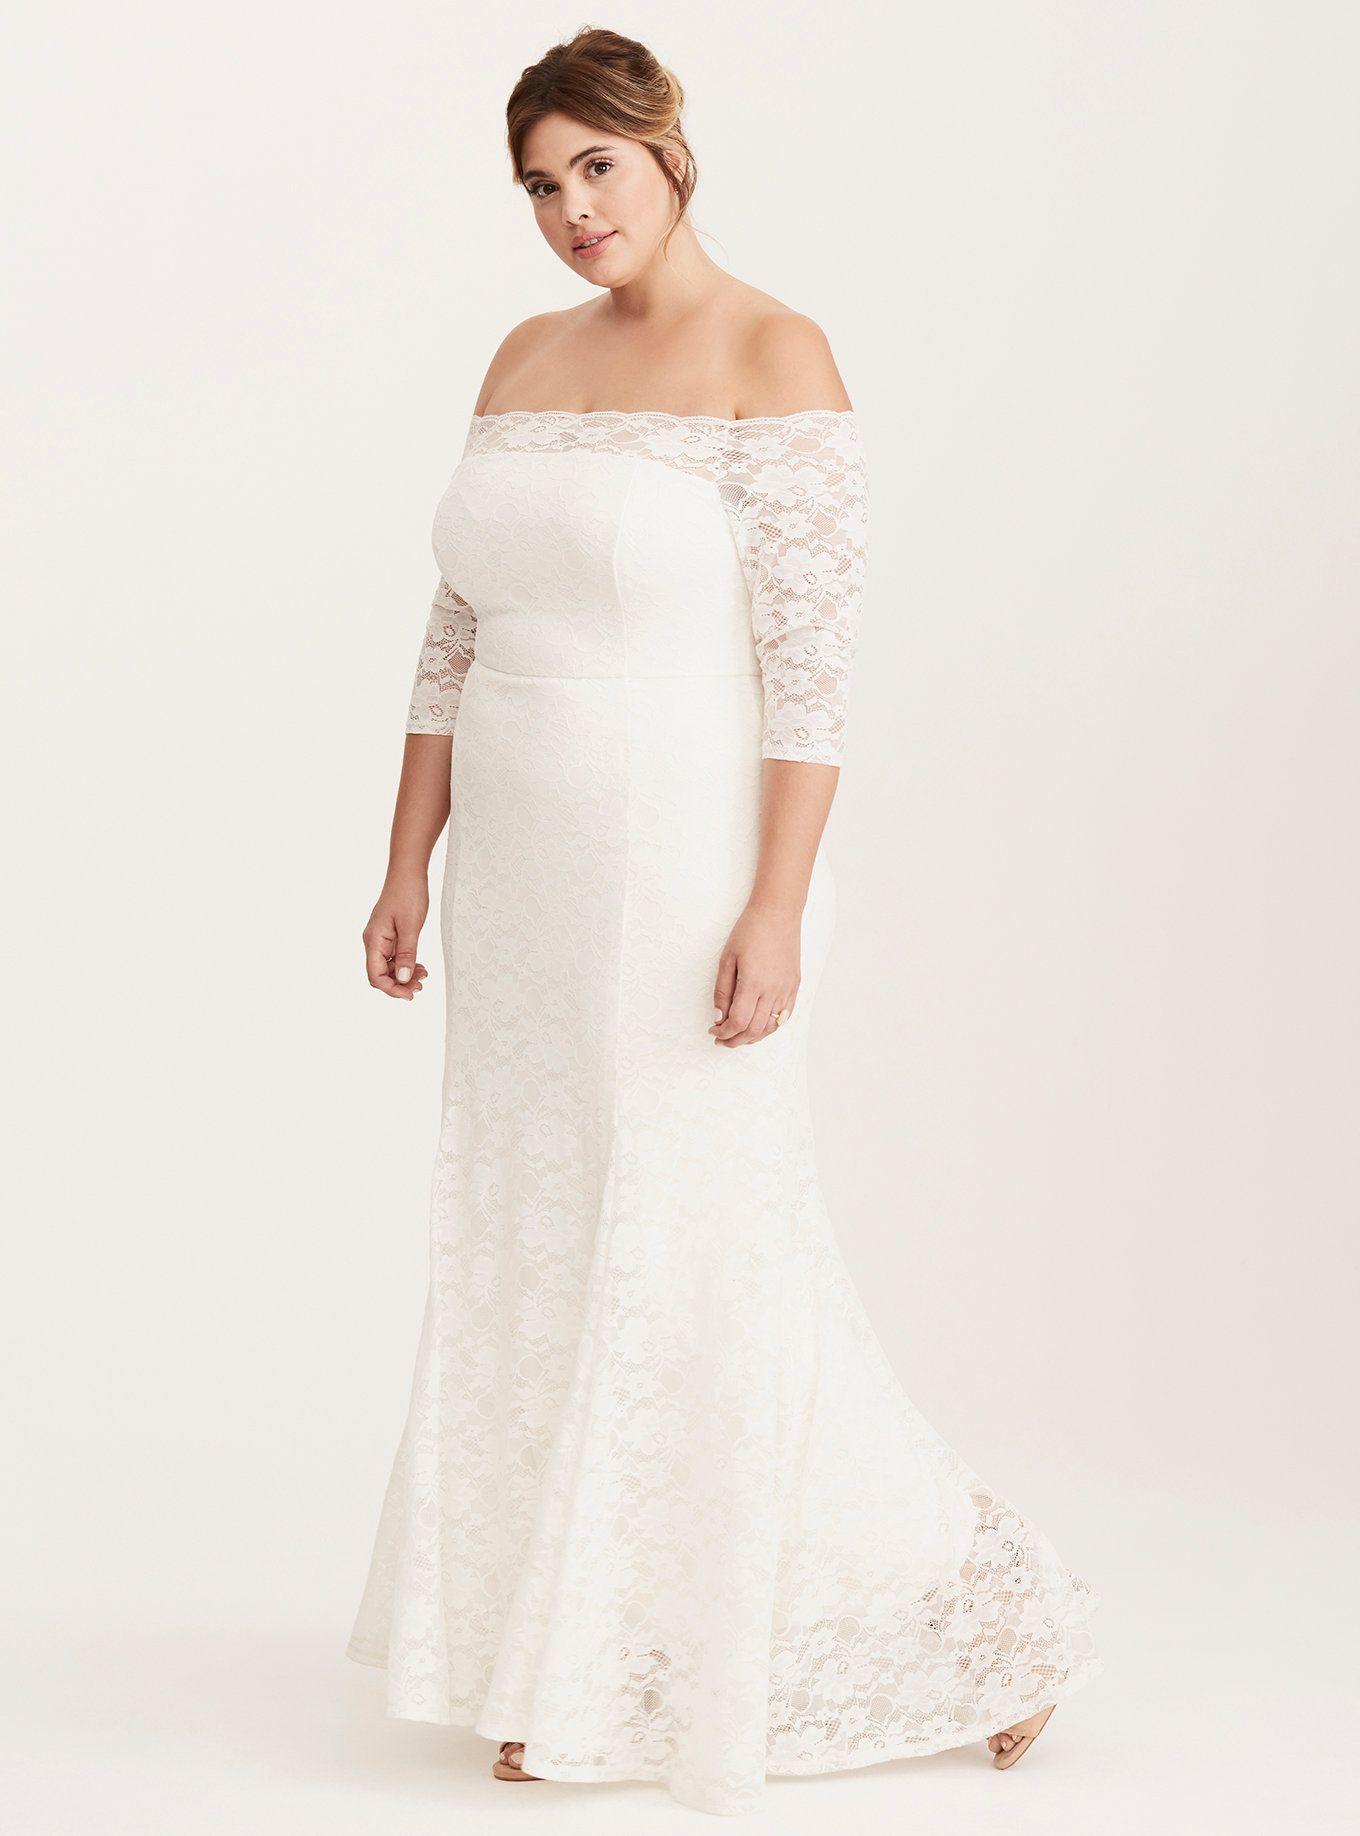 Ivory Lace Off Shoulder Fit Flare Wedding Dress Fit Flare